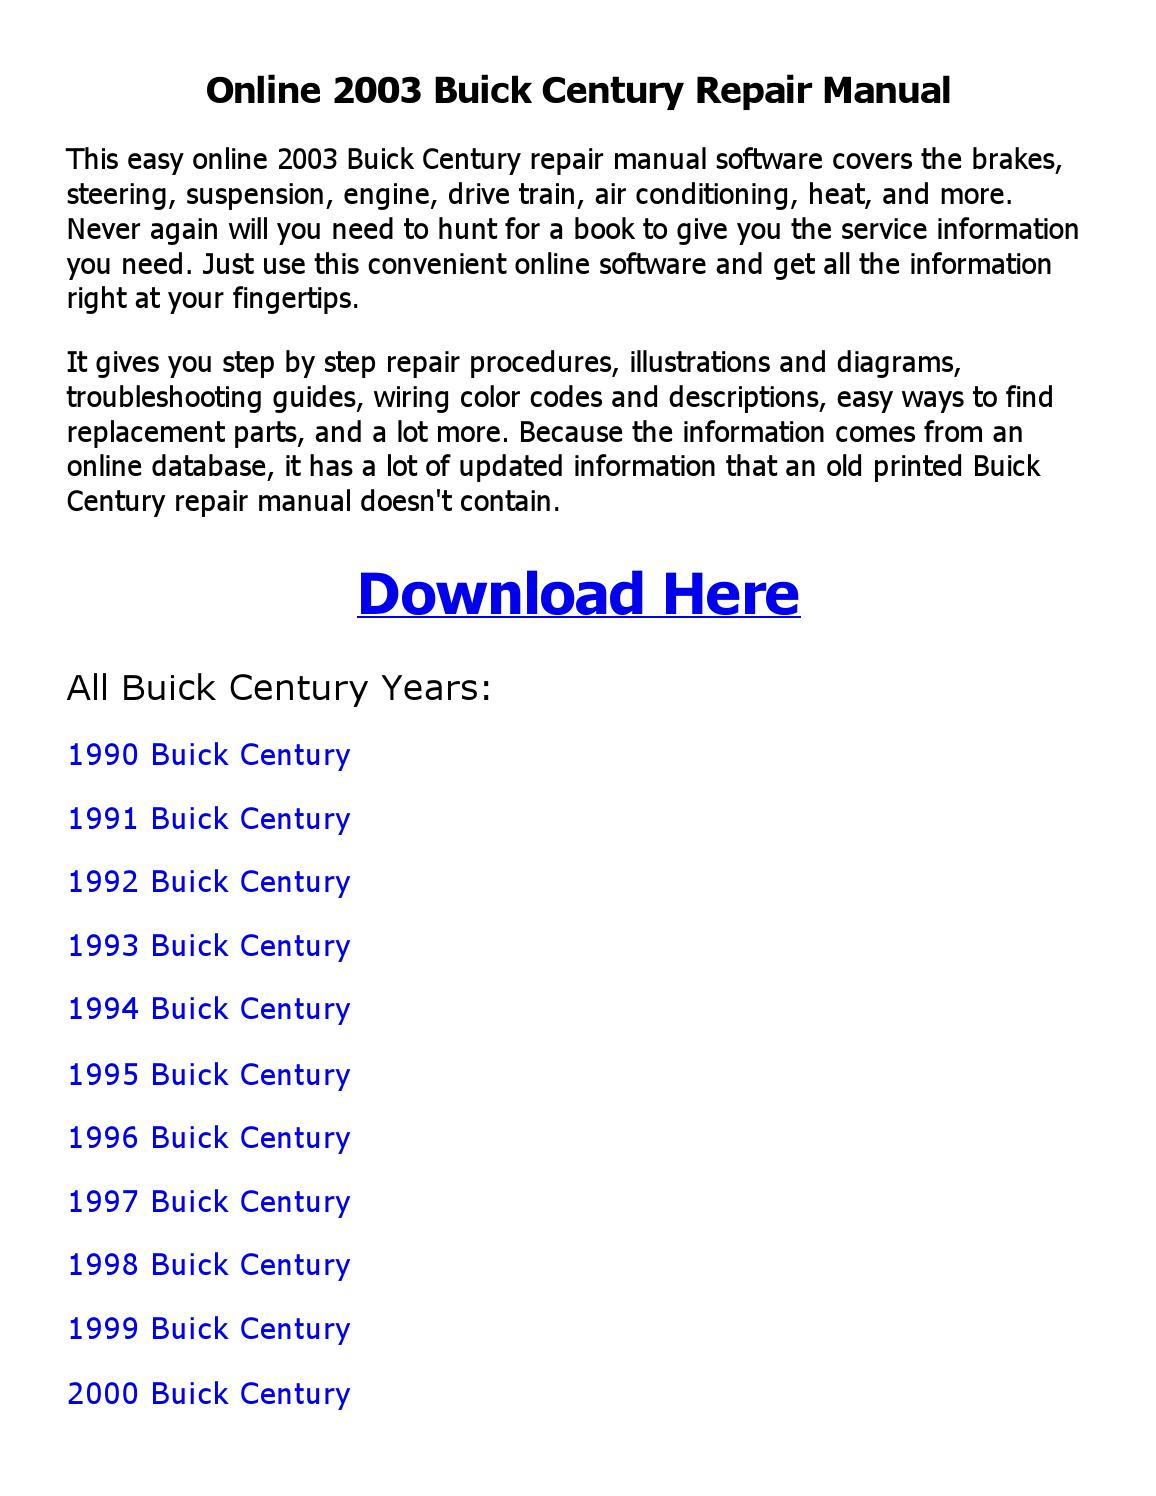 1995 Buick Century Repair Manual 96 Wiring Diagram 2003 Online By Ehsaan Issuu Rh Com Parts Catalog